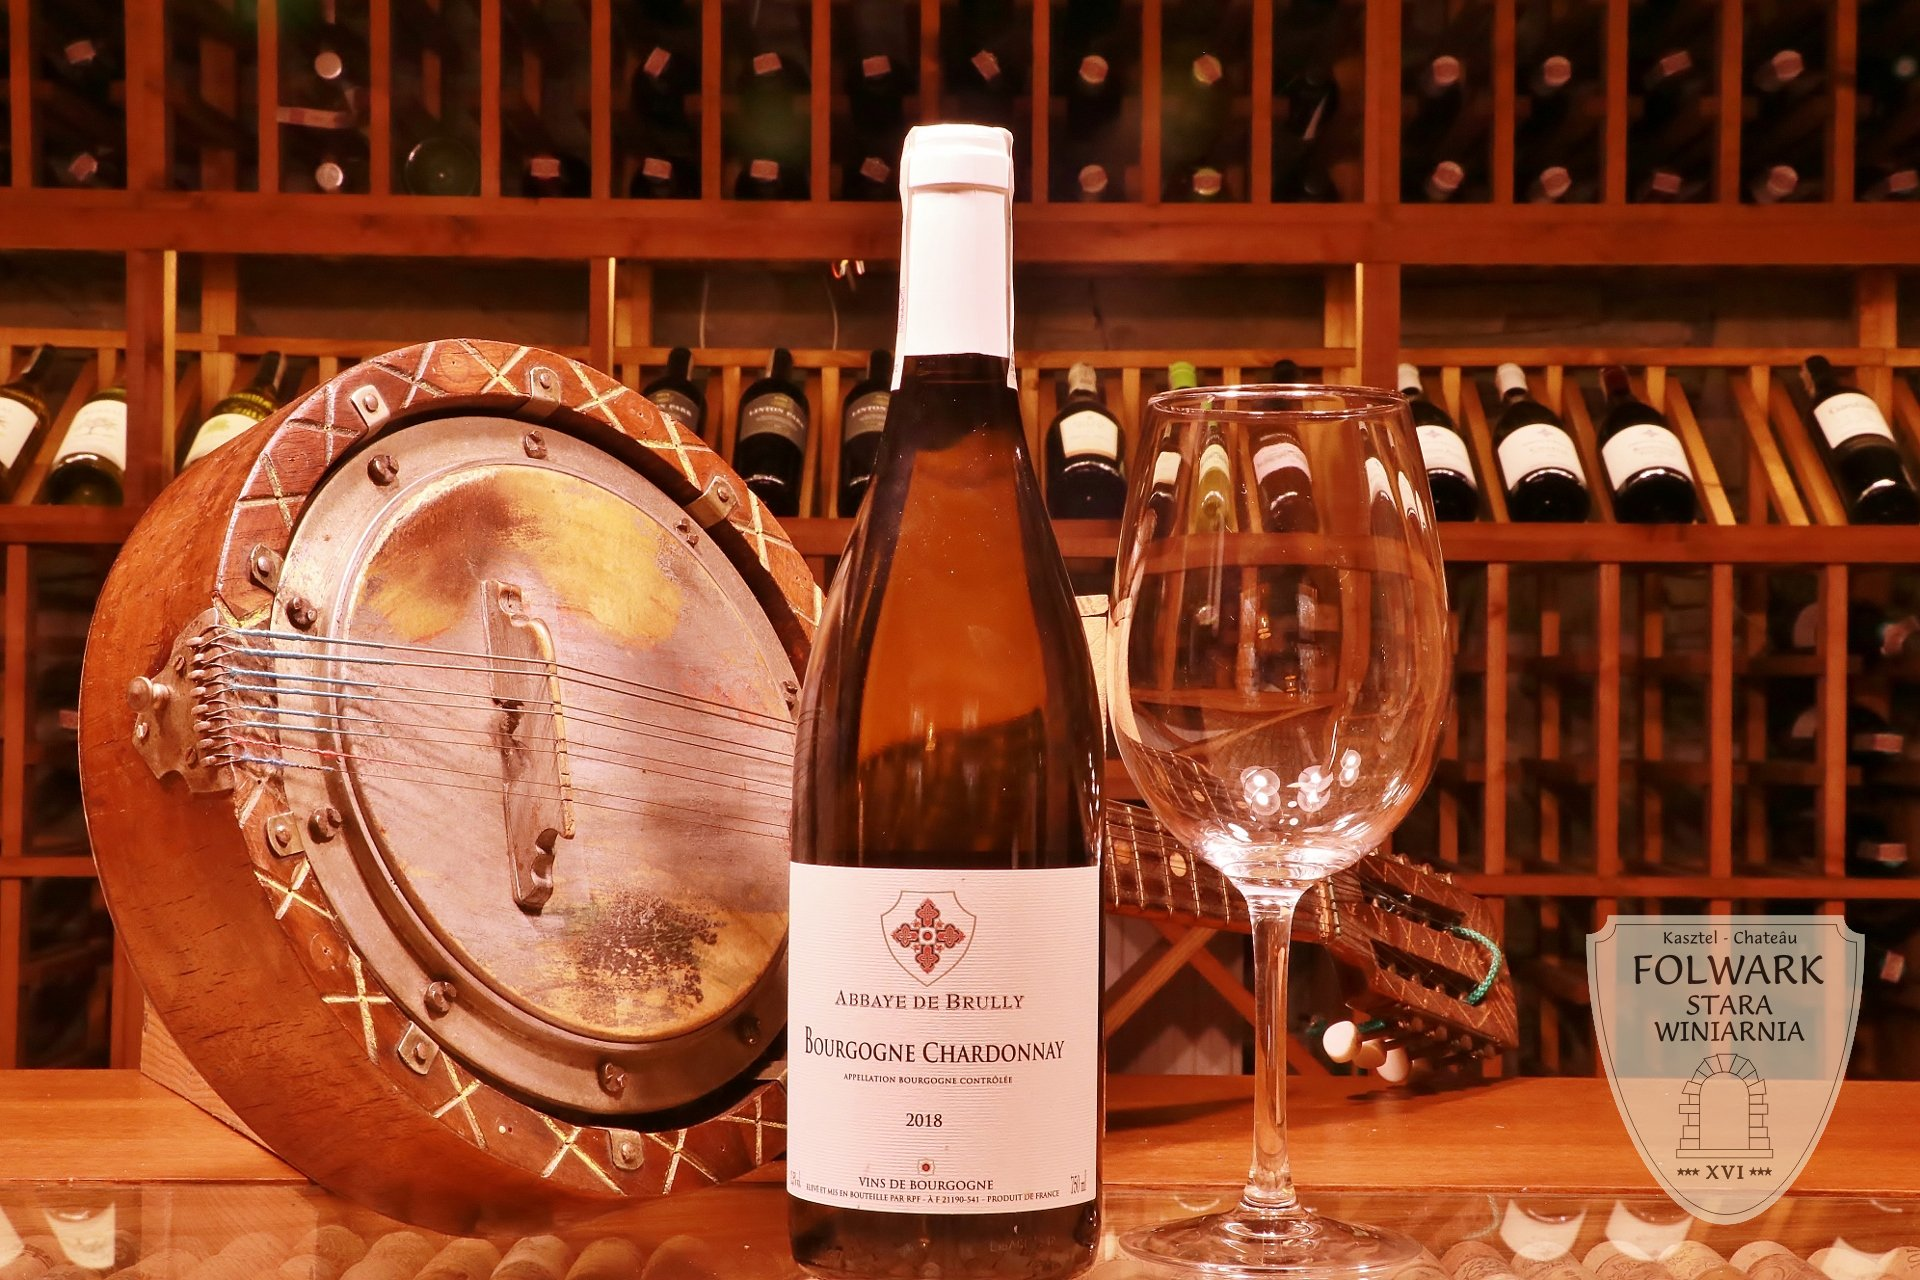 Abbaye de Brully Bourgogne Chardonnay Francja lubimywino pl